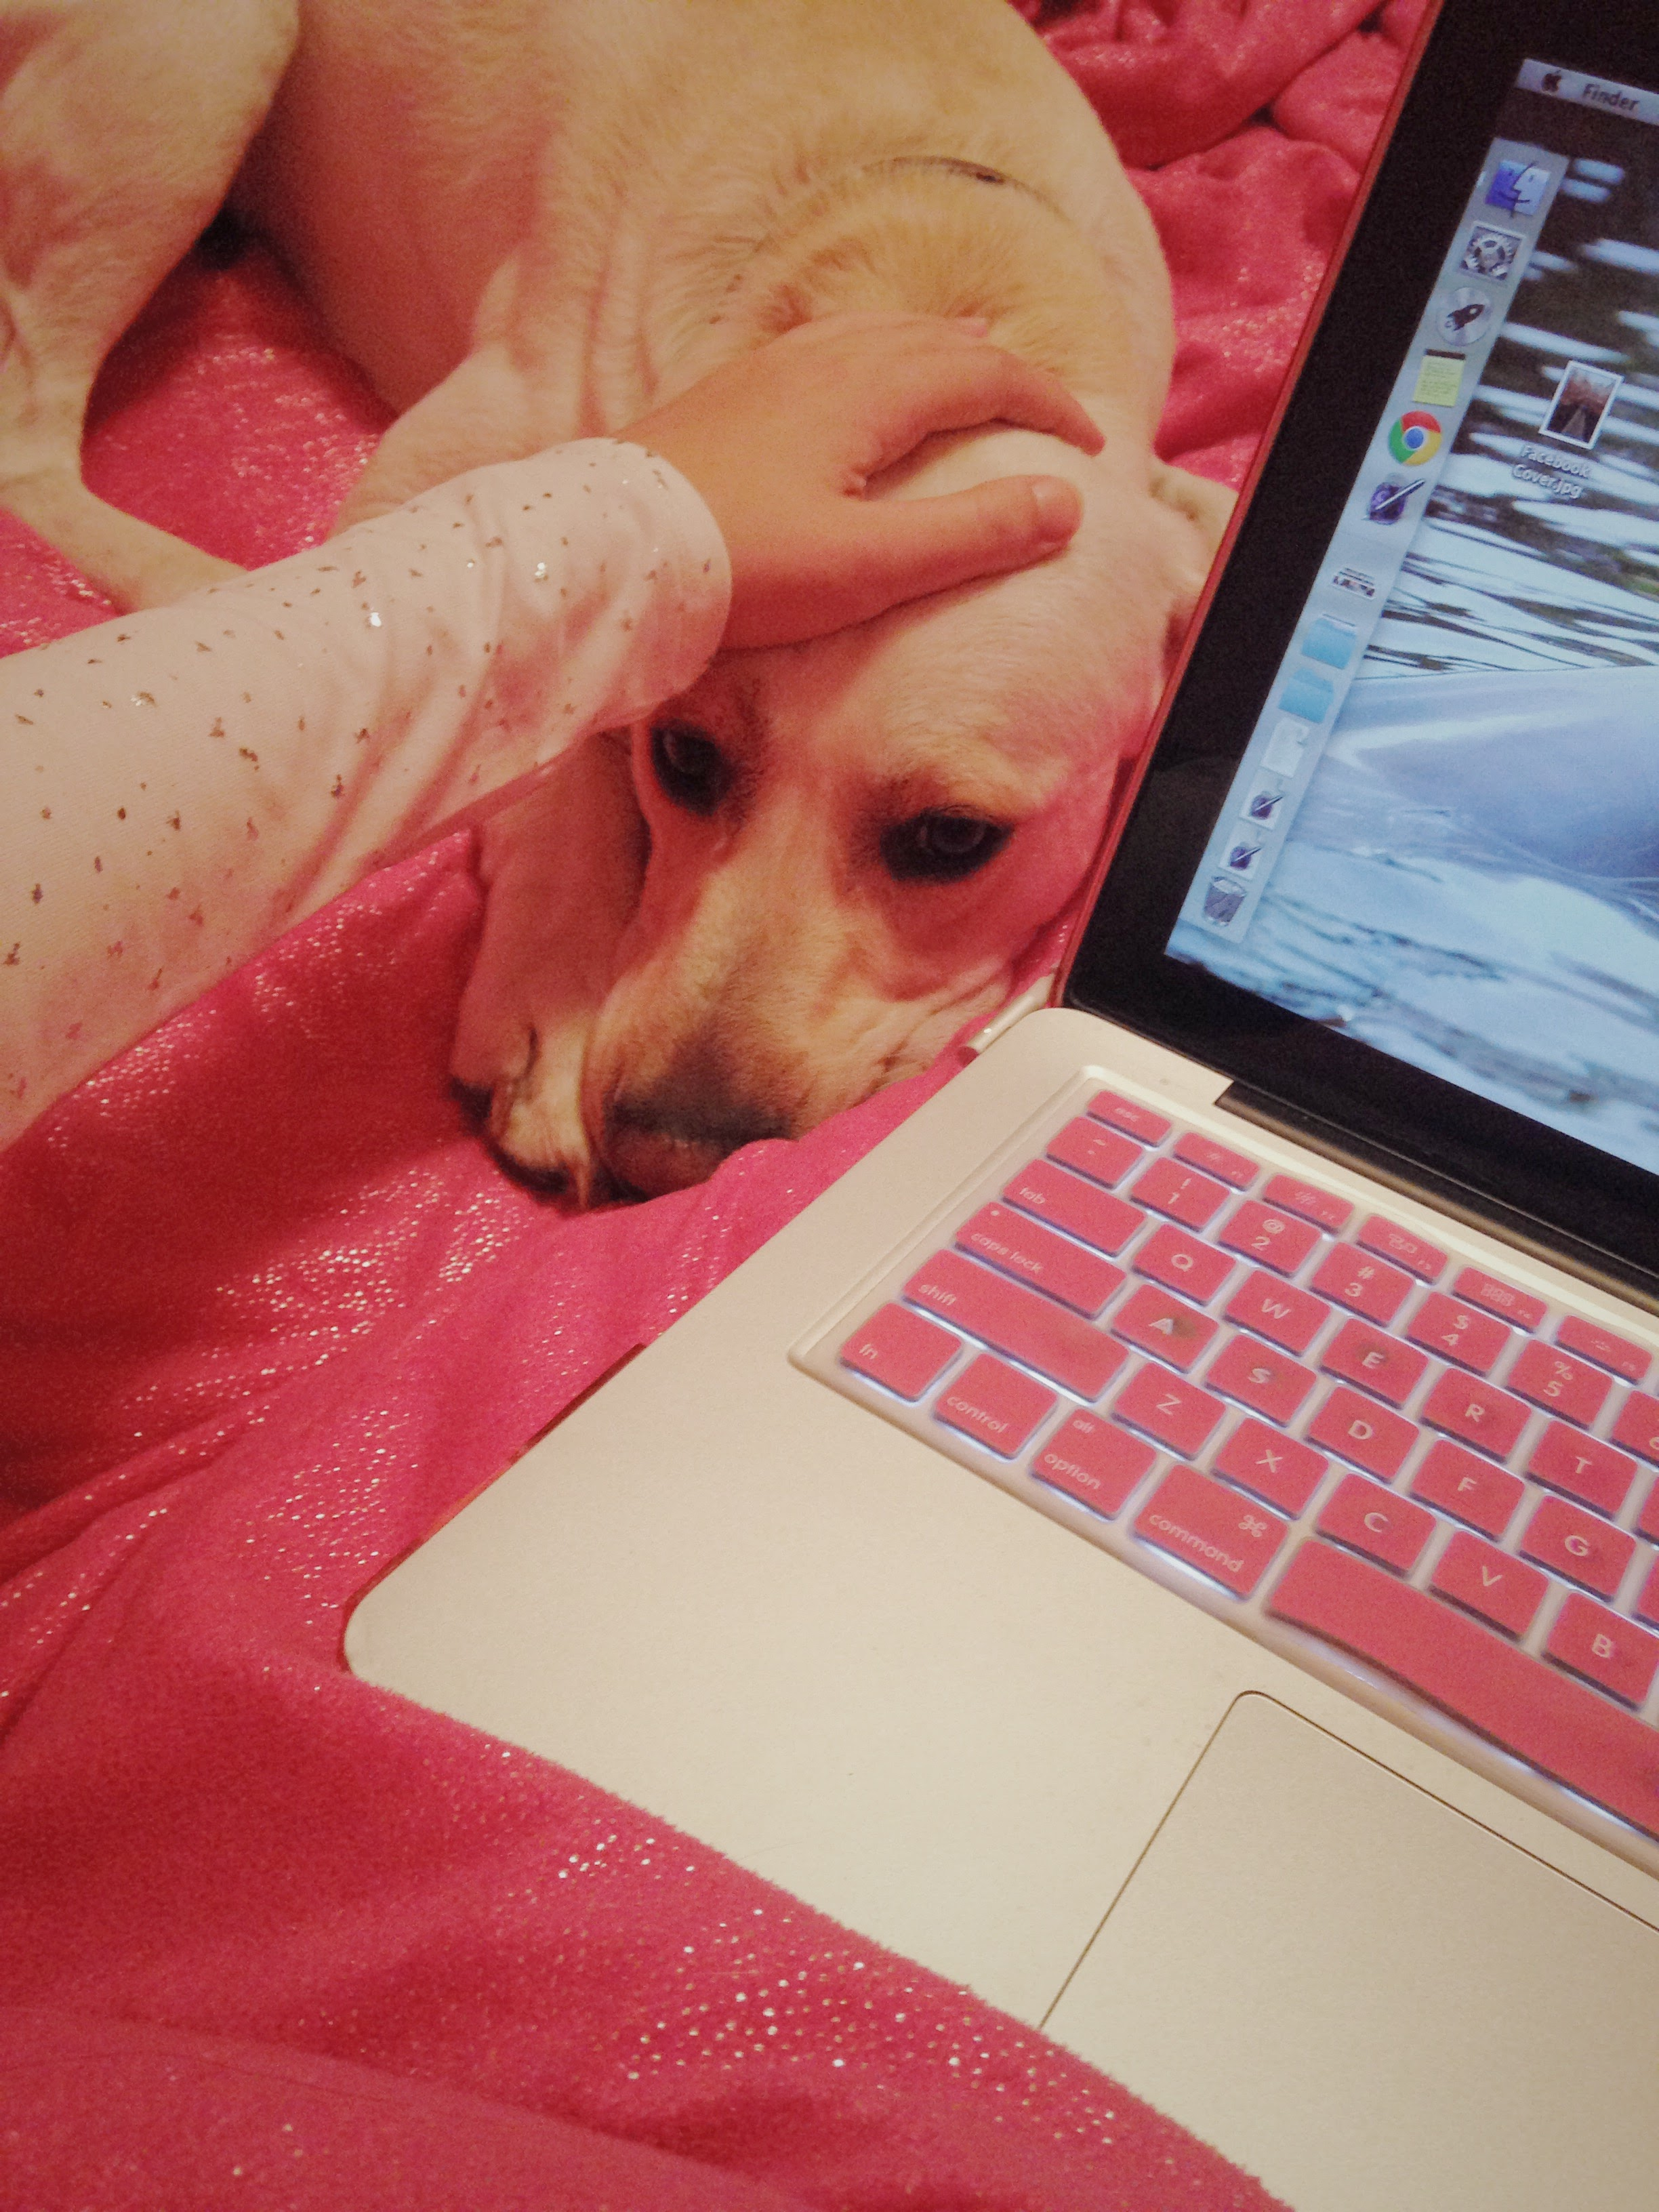 Ashlee-Petting-Willy-Blogging.jpg